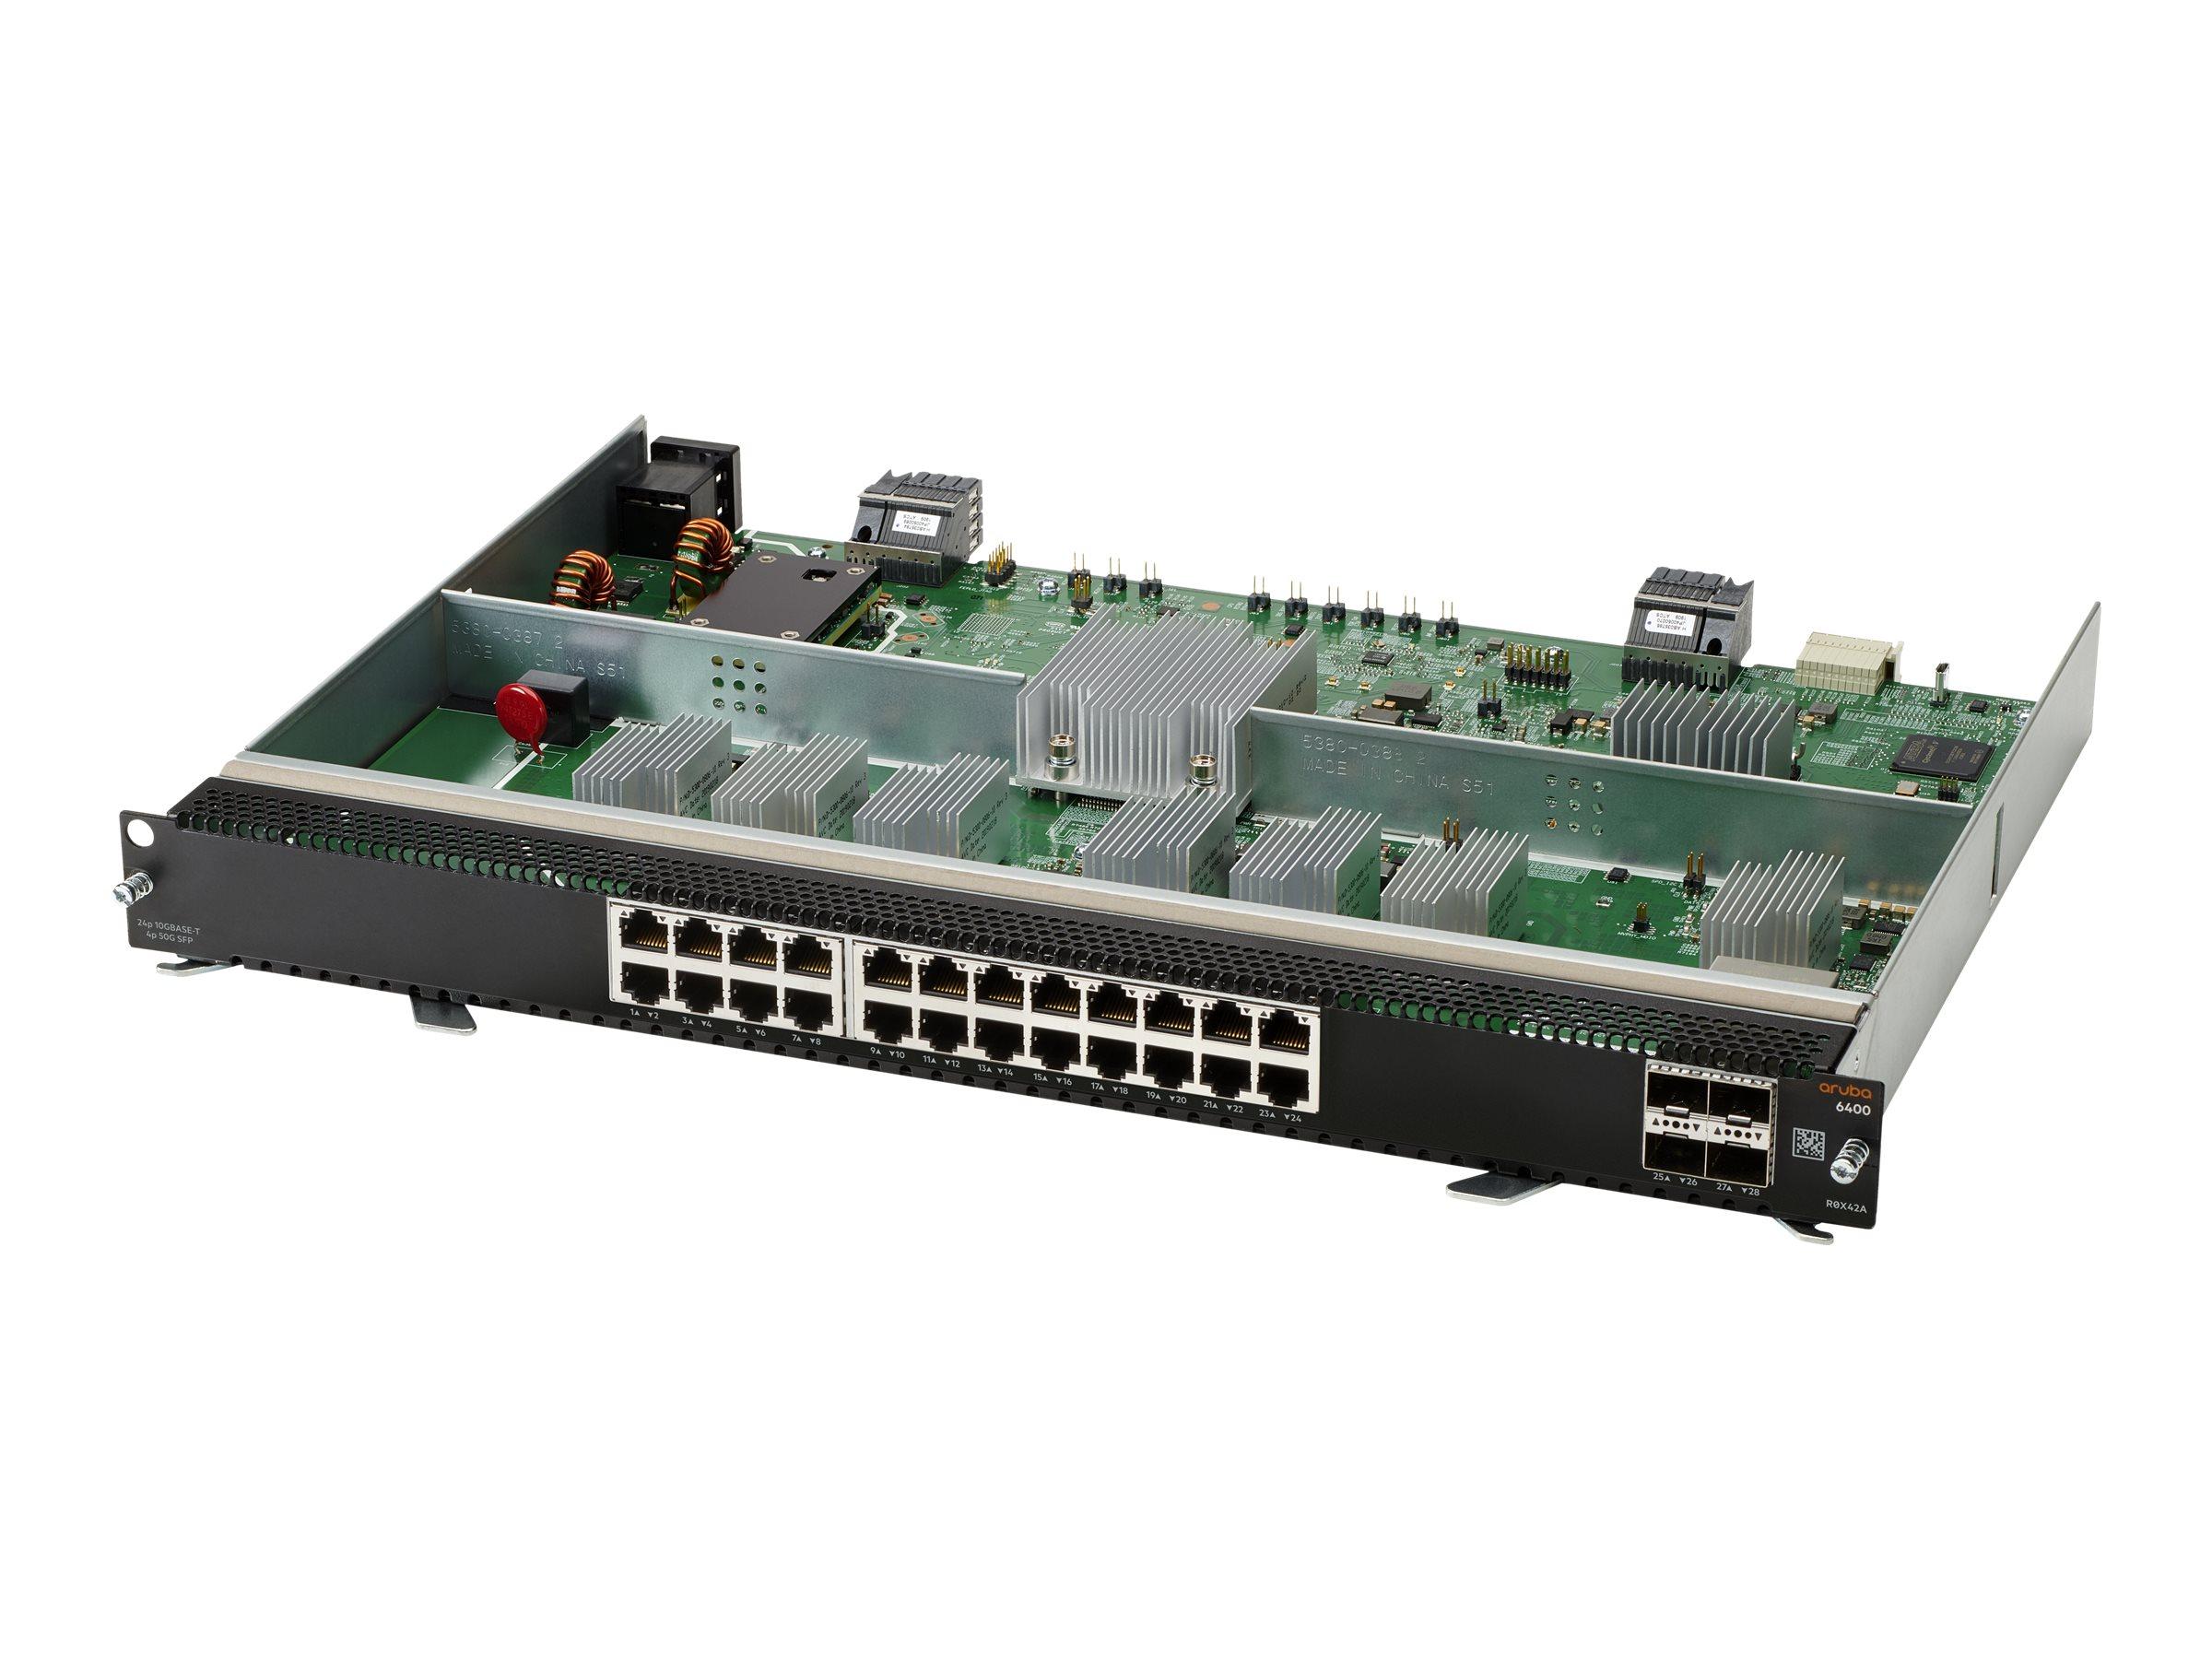 HPE Aruba 6400 - expansion module - 10Gb Ethernet x 24 + 1Gb Ethernet/10Gb Ethernet/25Gb Ethernet/50Gb Ethernet SFP56 x 4